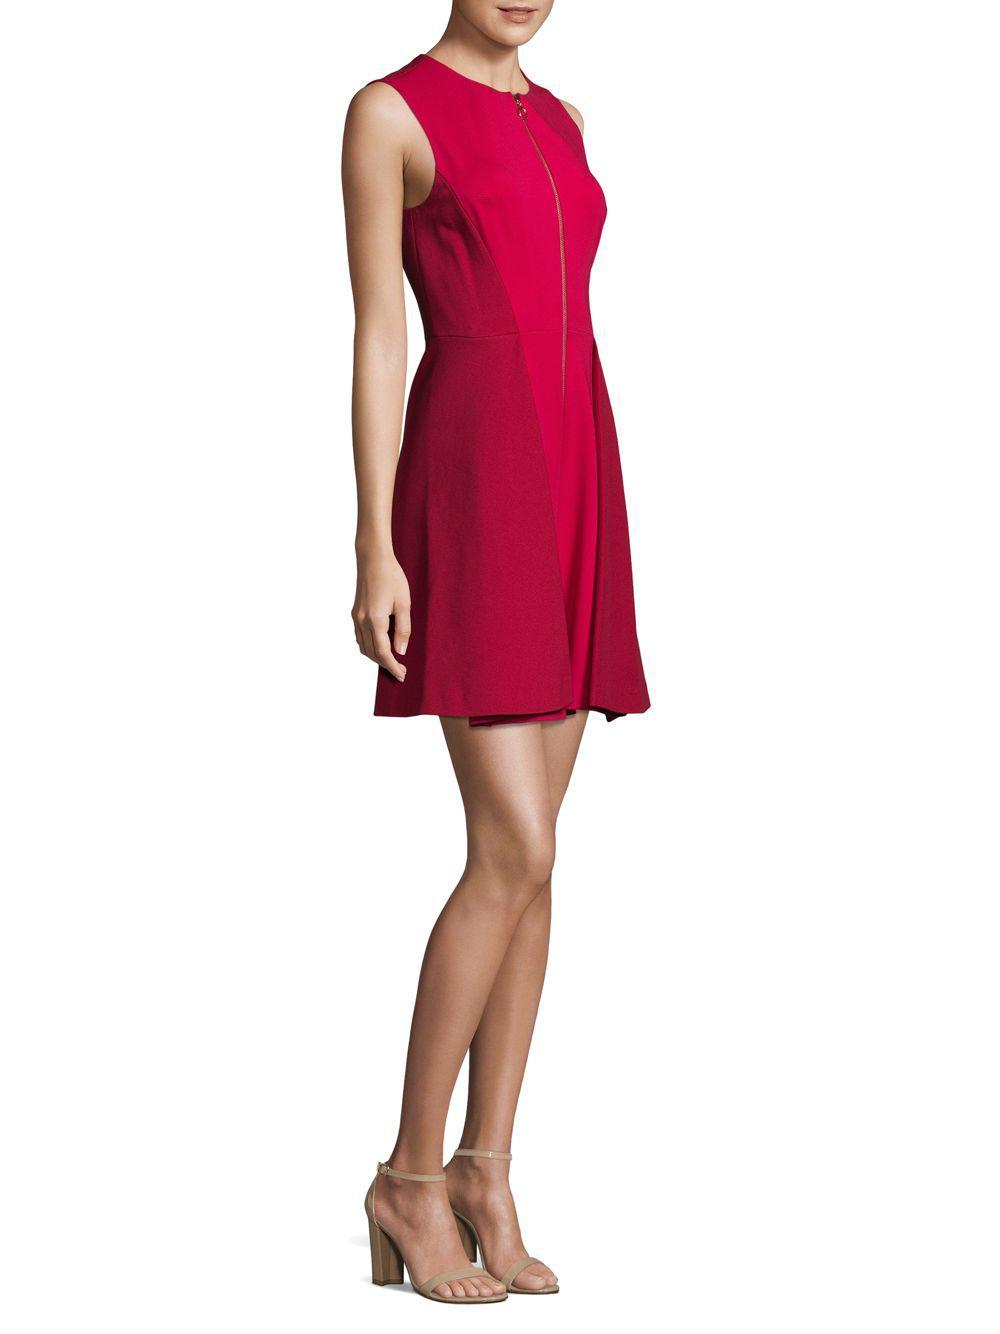 e8d7b8a6 Lyst - Elie Tahari Embline Sleeveless Dress in Red - Save 25%